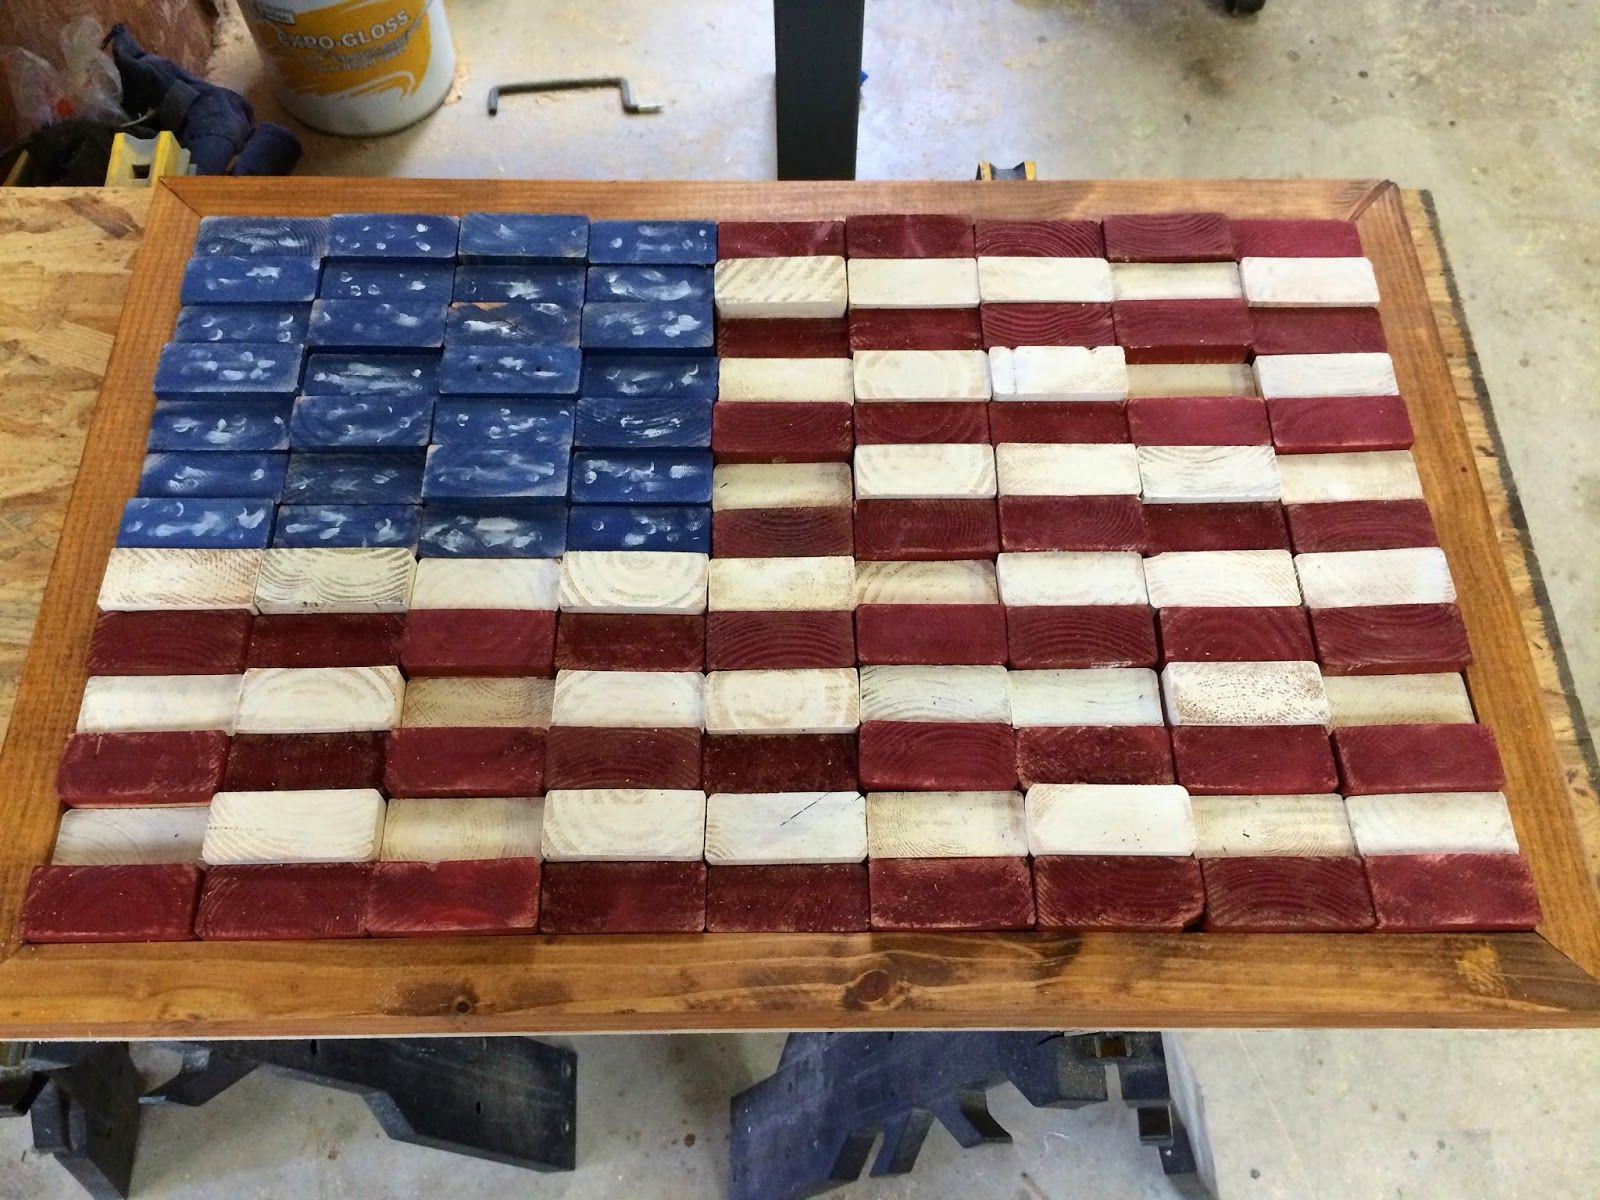 Wilker Do S Scrap 2x4 Flag 2x4 Wood Projects American Flag Wood Scrap Wood Projects